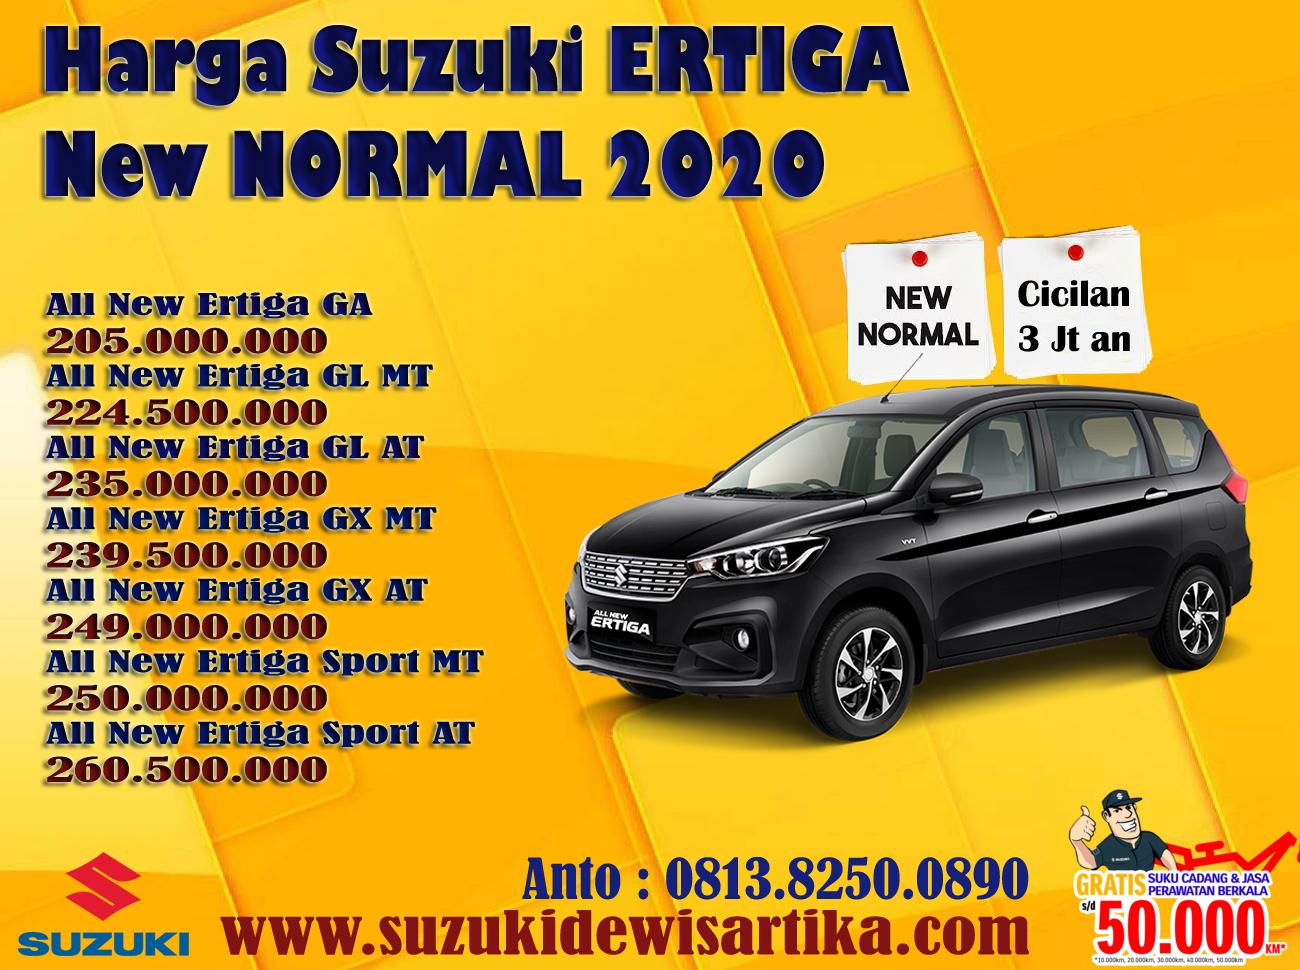 Promo Suzuki All New Ertiga Harga Dan Paket Kredit New Normal 2020 Harga Suzuki Ertiga Dp 15 Juta Promo Suzuki Ertiga Paket Kredit Suzuki Ertiga Terbaru 2021 Promo Suzuki Xl7